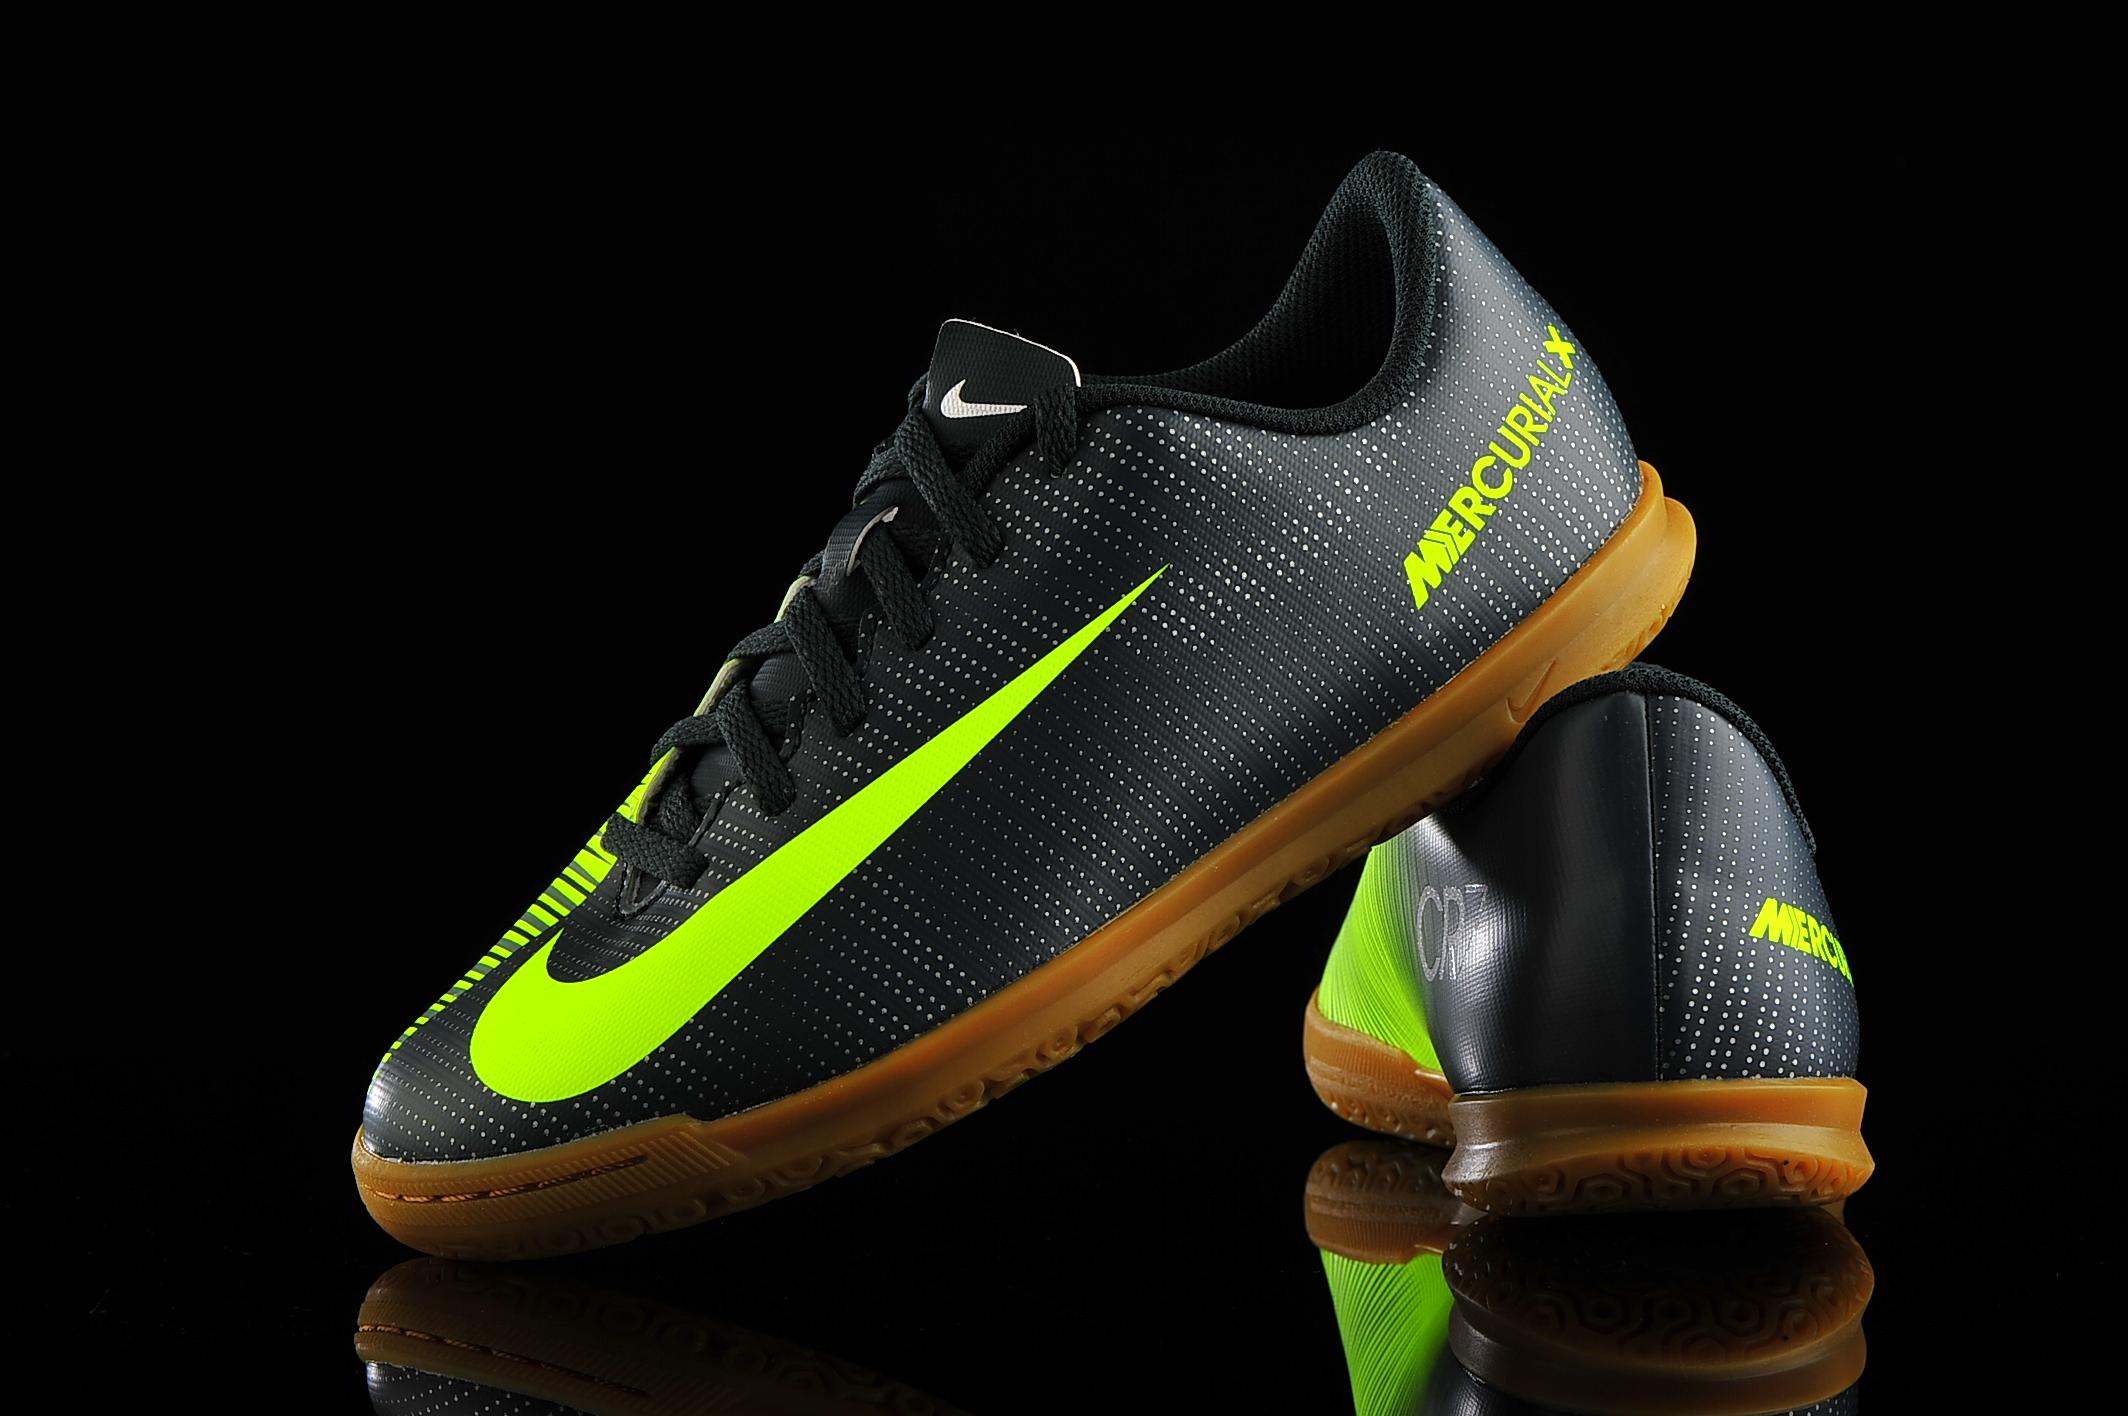 Ambigüedad puerta Síguenos  Nike MercurialX Vortex III IC CR7 Junior 852495-376 | R-GOL.com - Football  boots & equipment